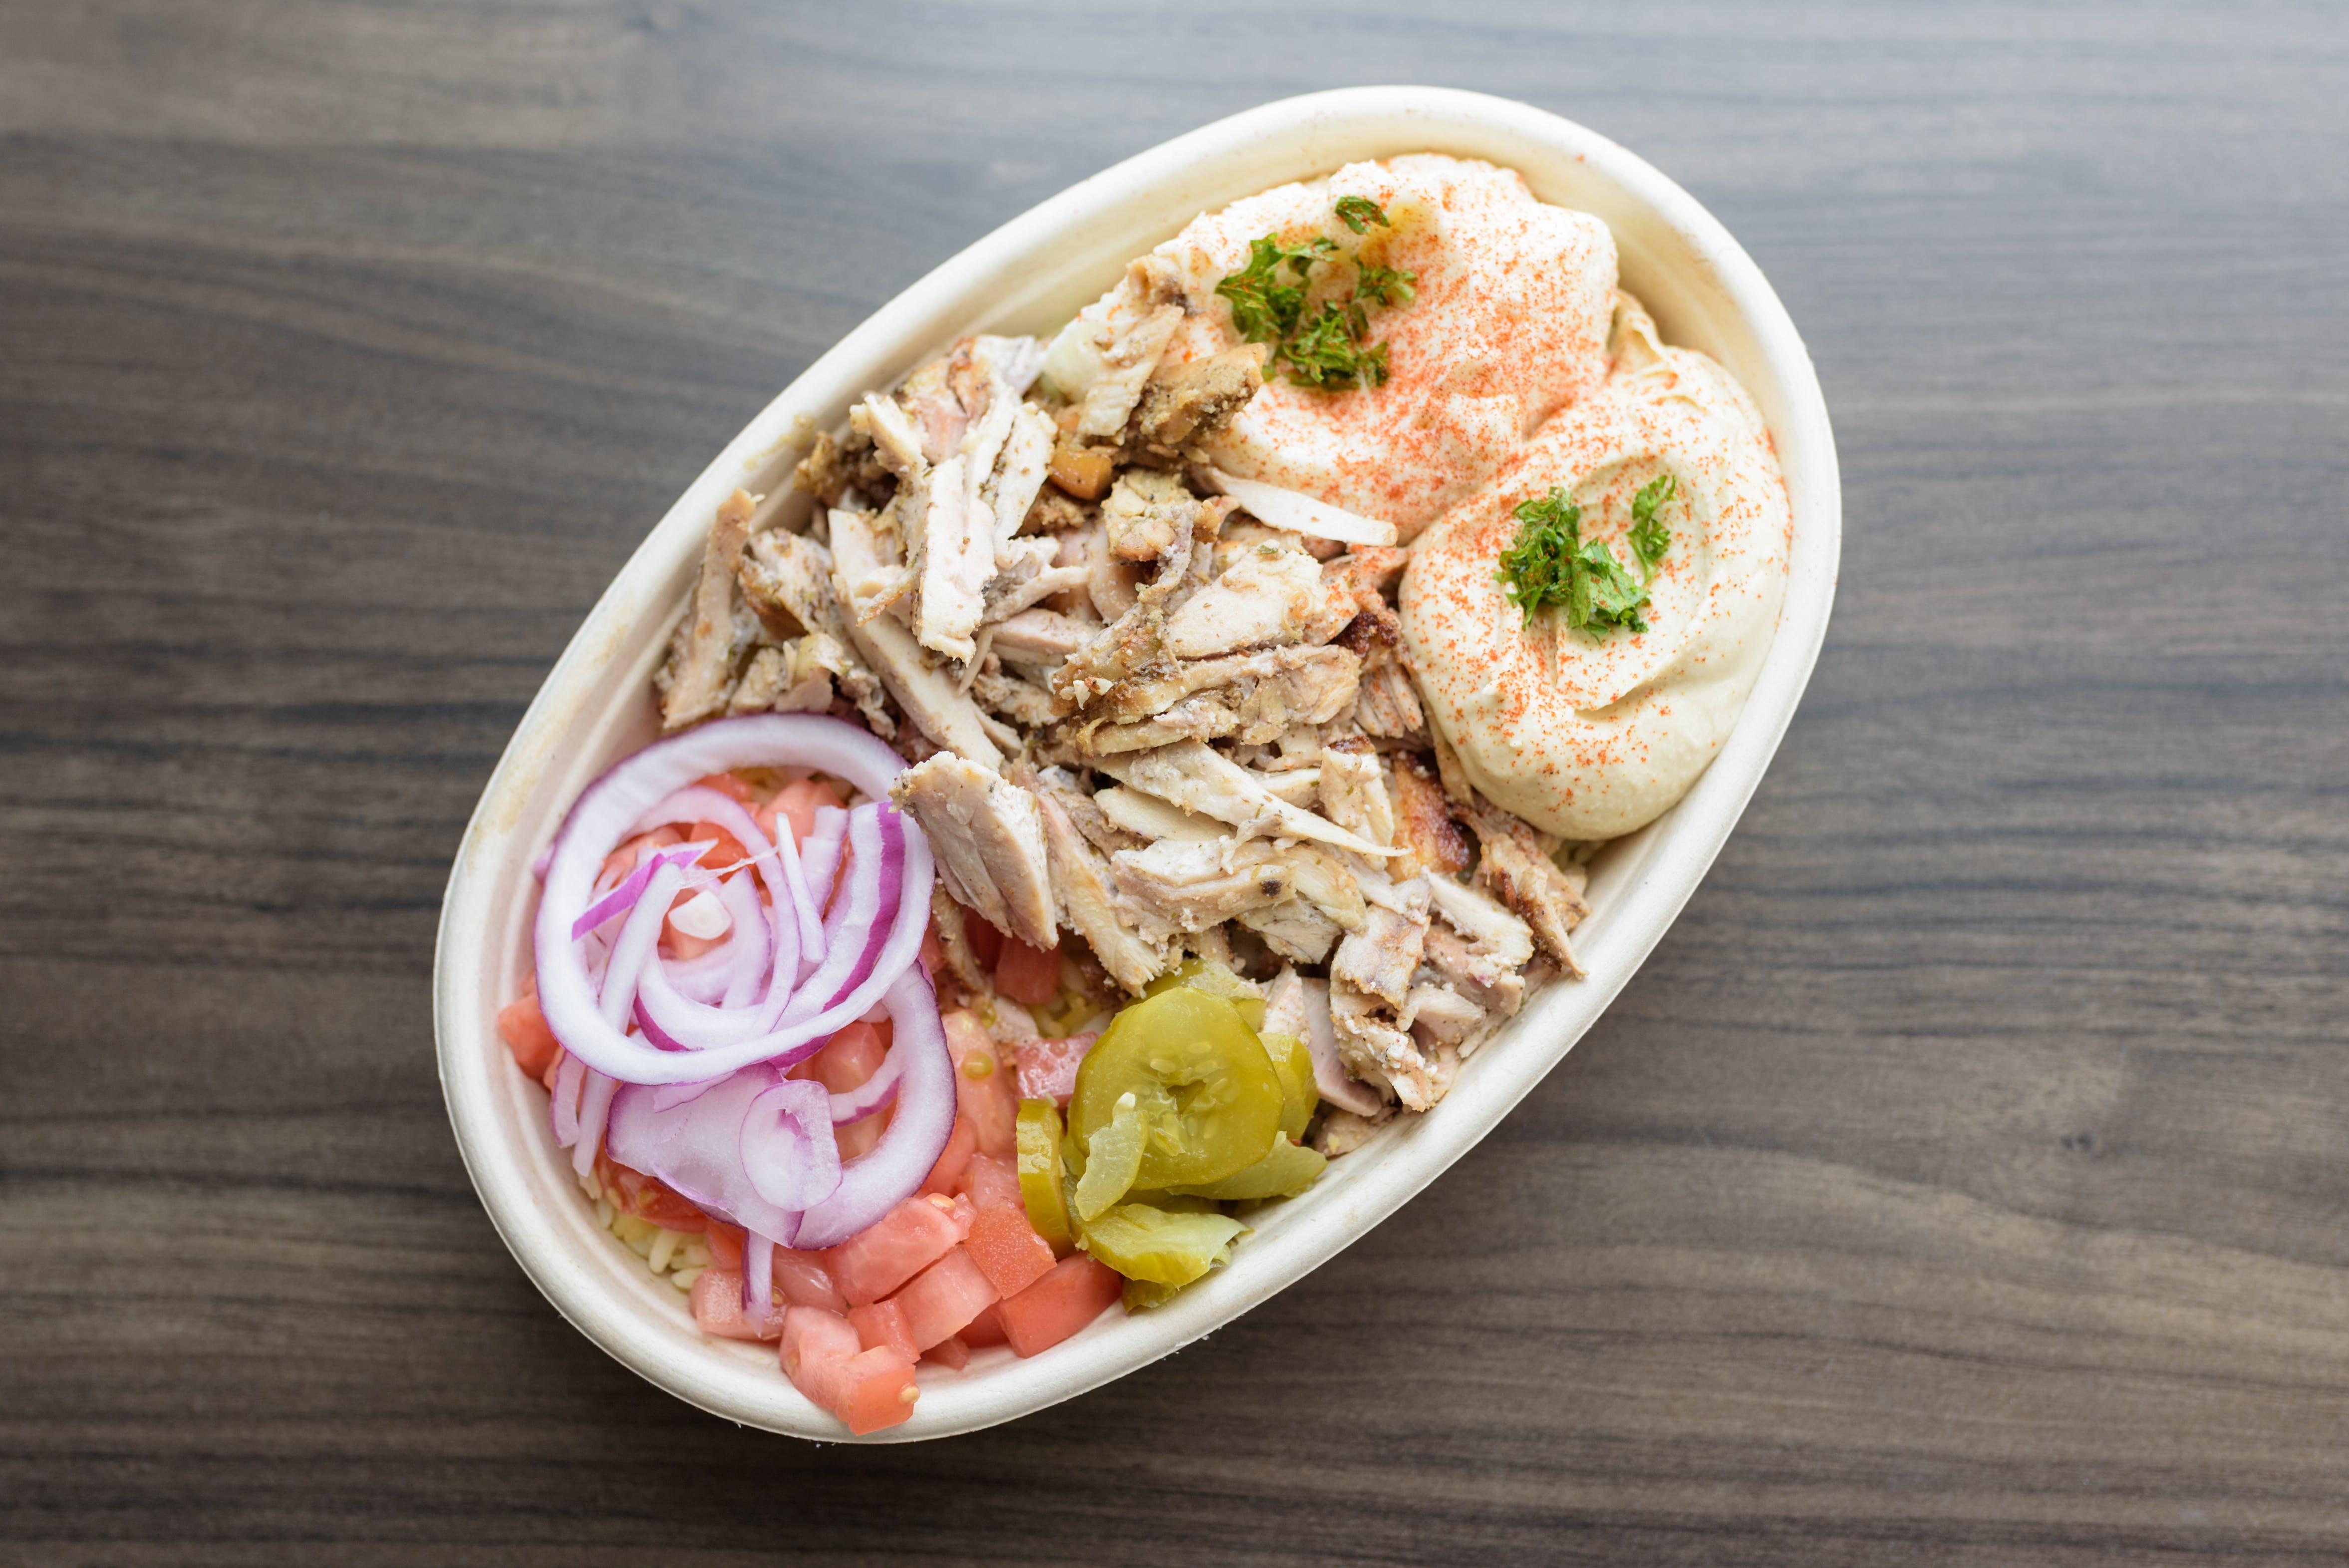 Chicken Shawarma Bowl from Baba Dari Ann Arbor in Ann Arbor, MI